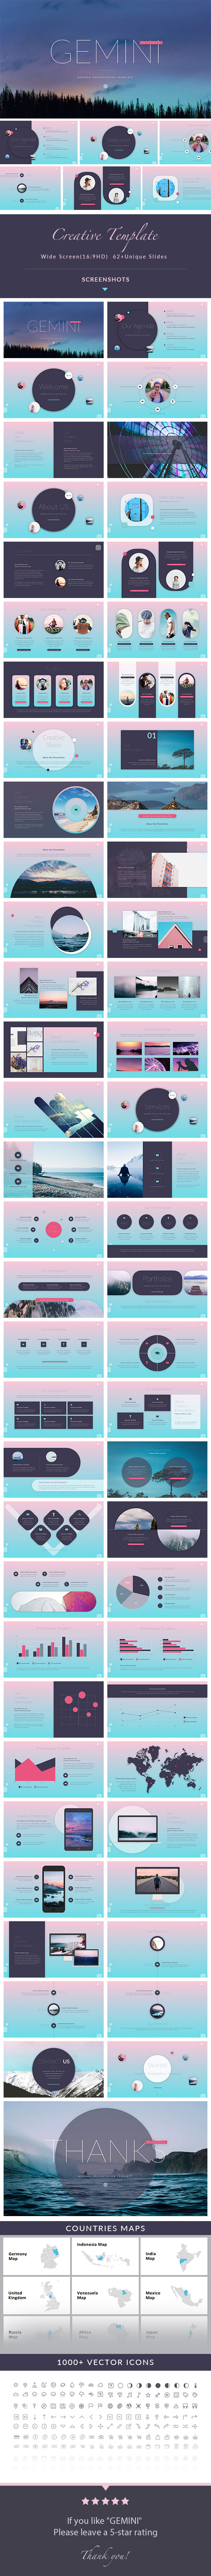 GEMINI - Creative PowerPoint Presentation Template - Creative PowerPoint Templates